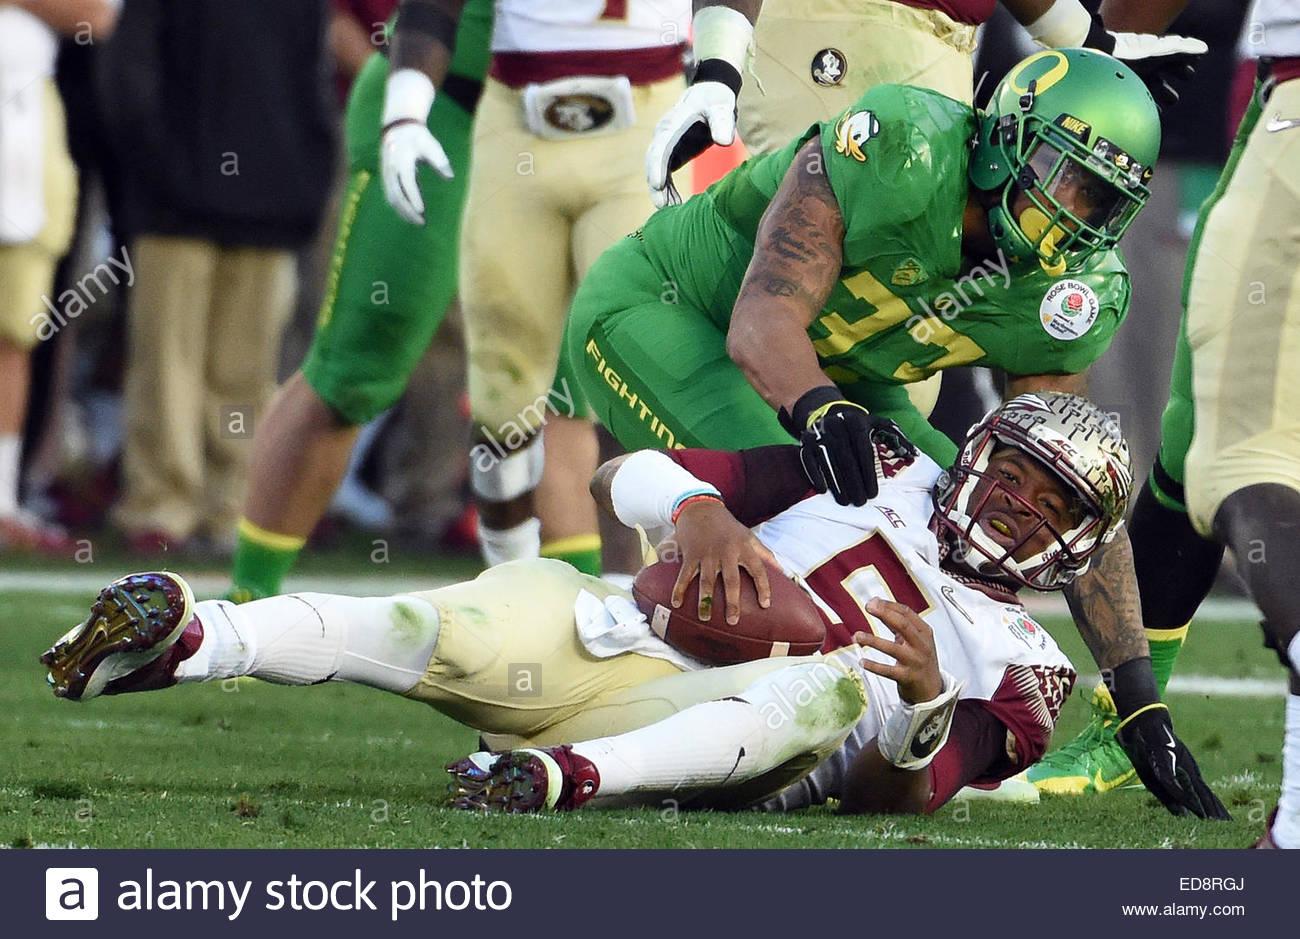 Pasadena, California, USA. 01st Jan, 2015. Florida State Seminoles quarterback Jameis Winston (5) after being tackled - Stock Image